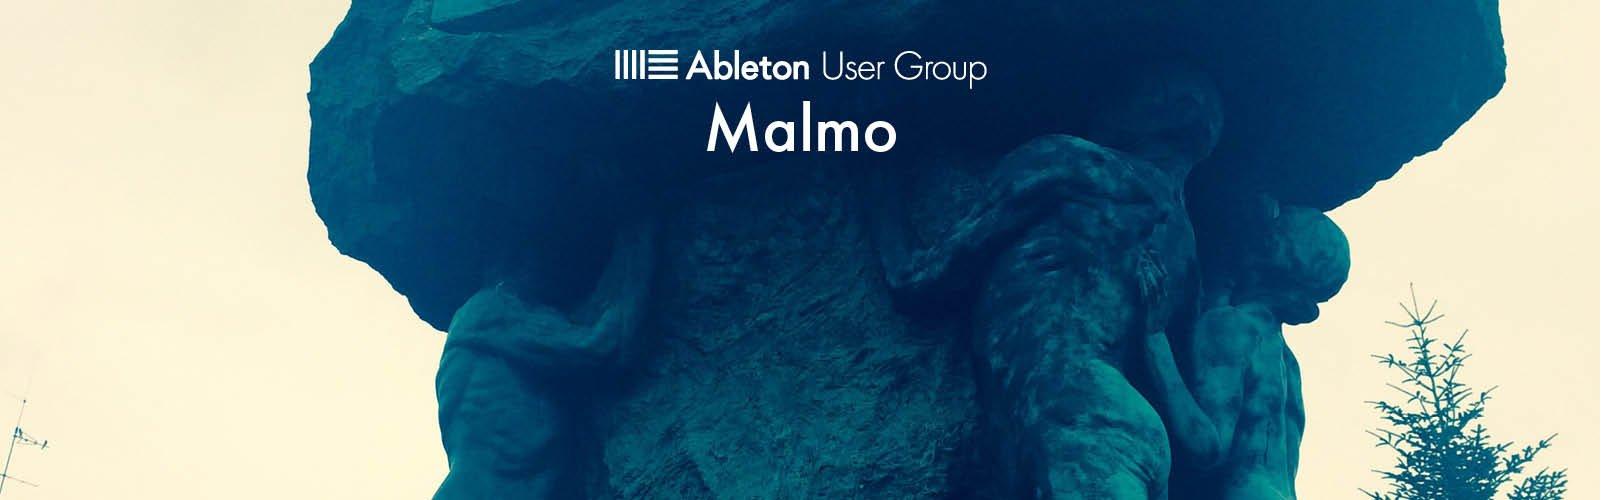 Malmo Ableton User Group Banner.jpg